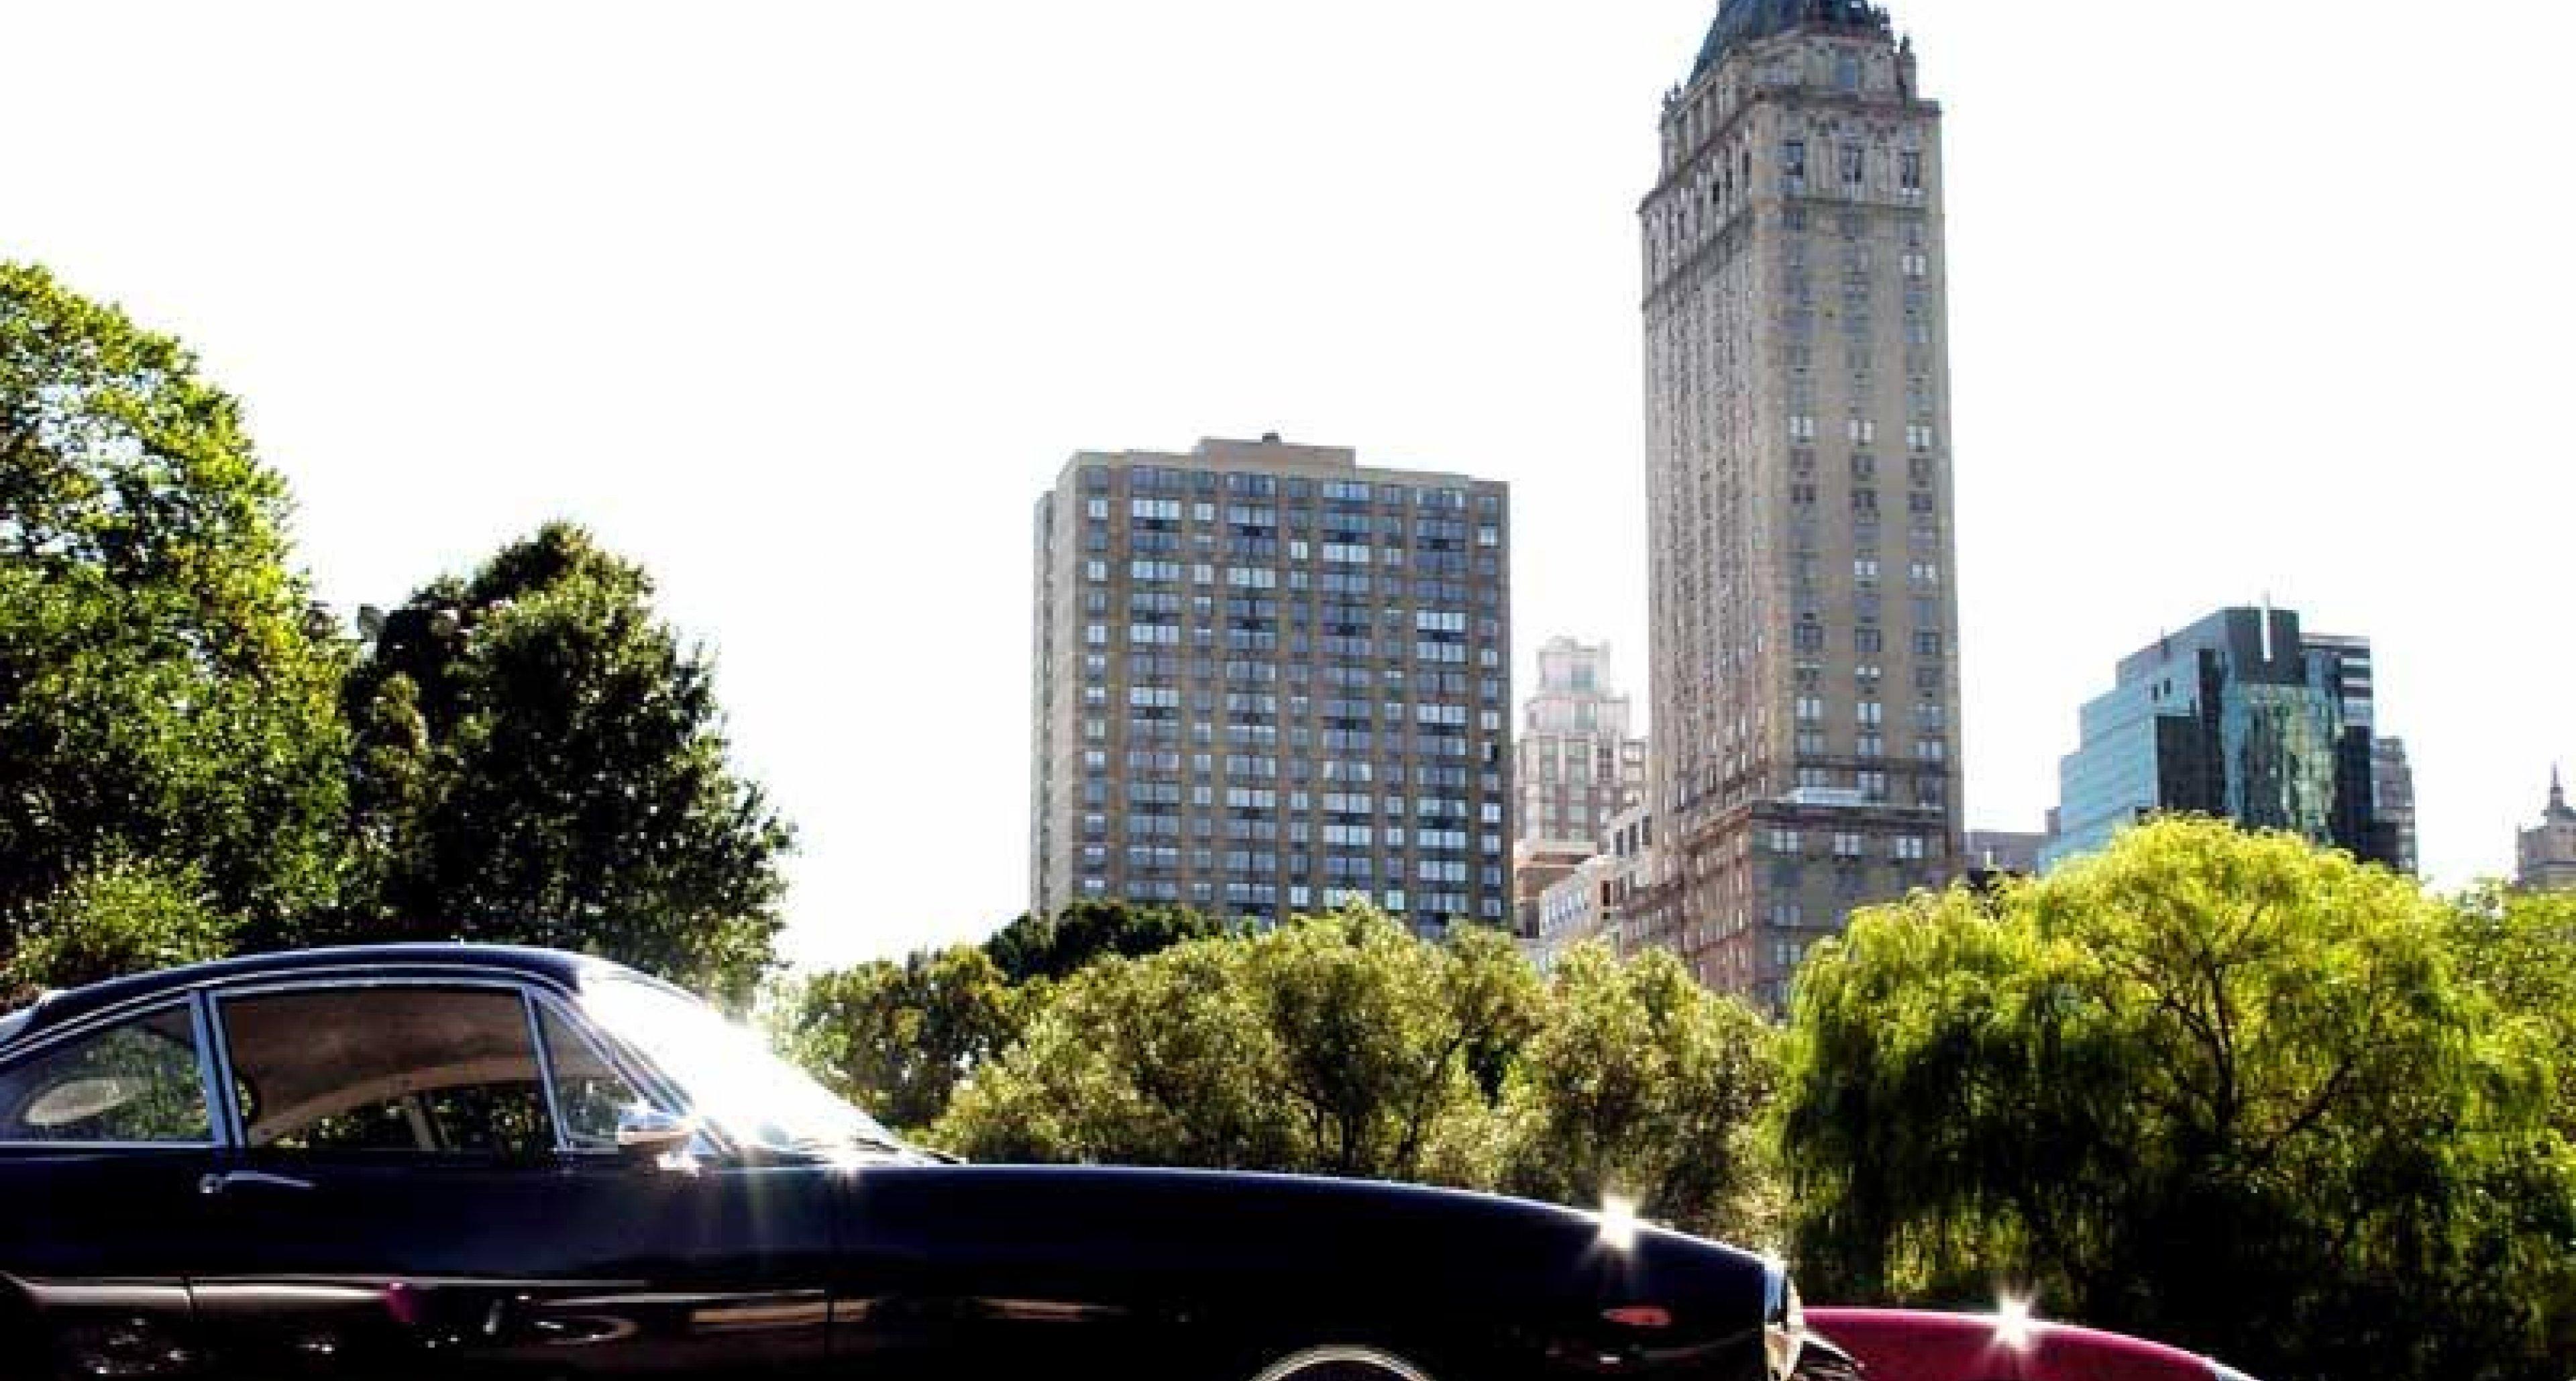 New York City Concours d'Elegance